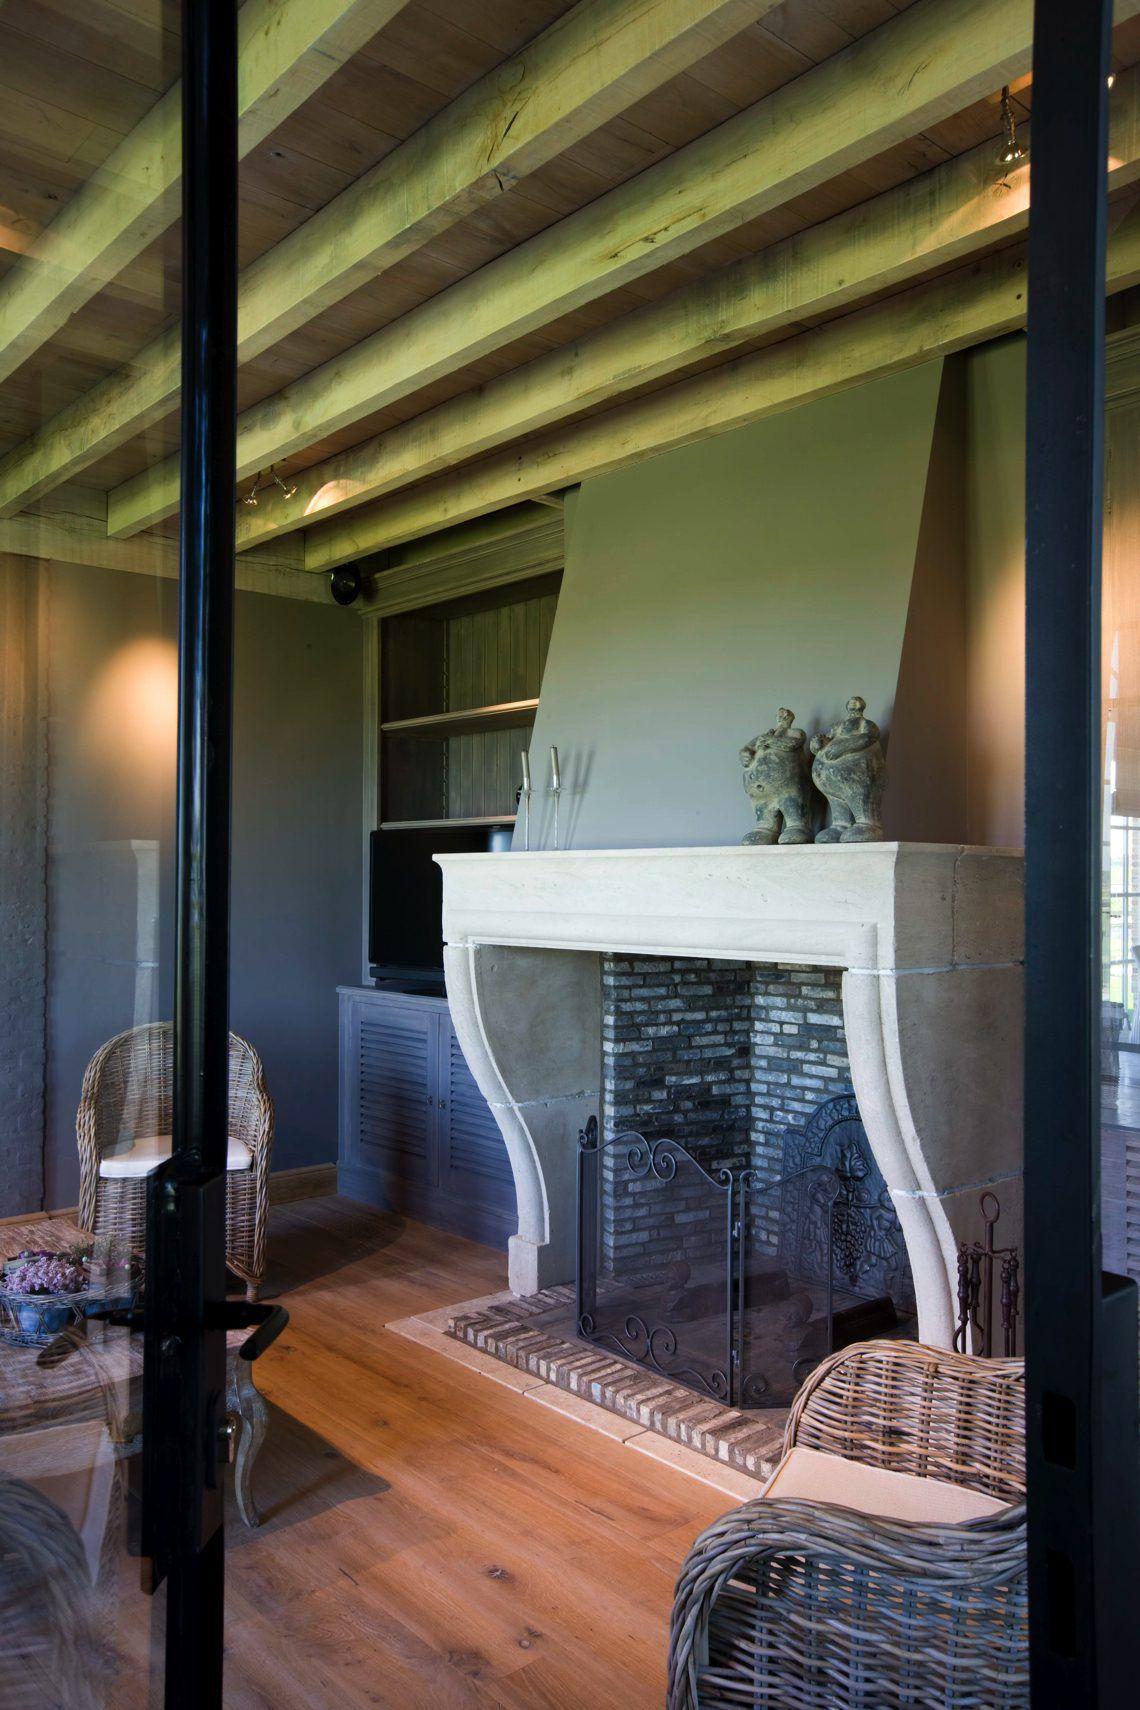 ABC Projects | Interior architecture - Project Elverdinge landelijke ...